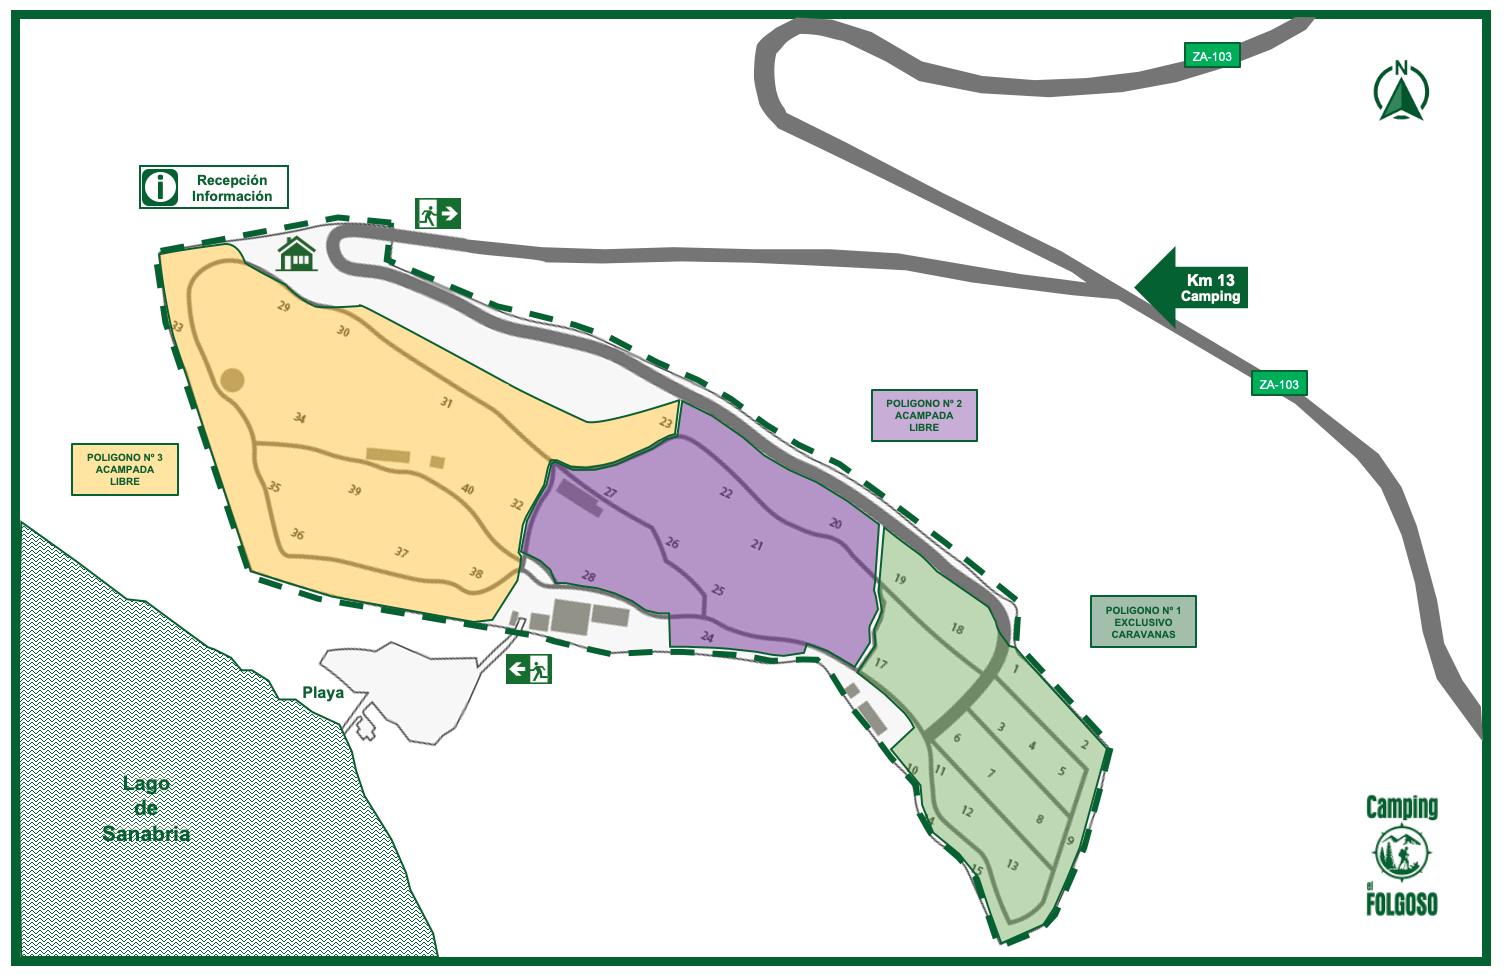 Camping Folgoso Plano Sectores